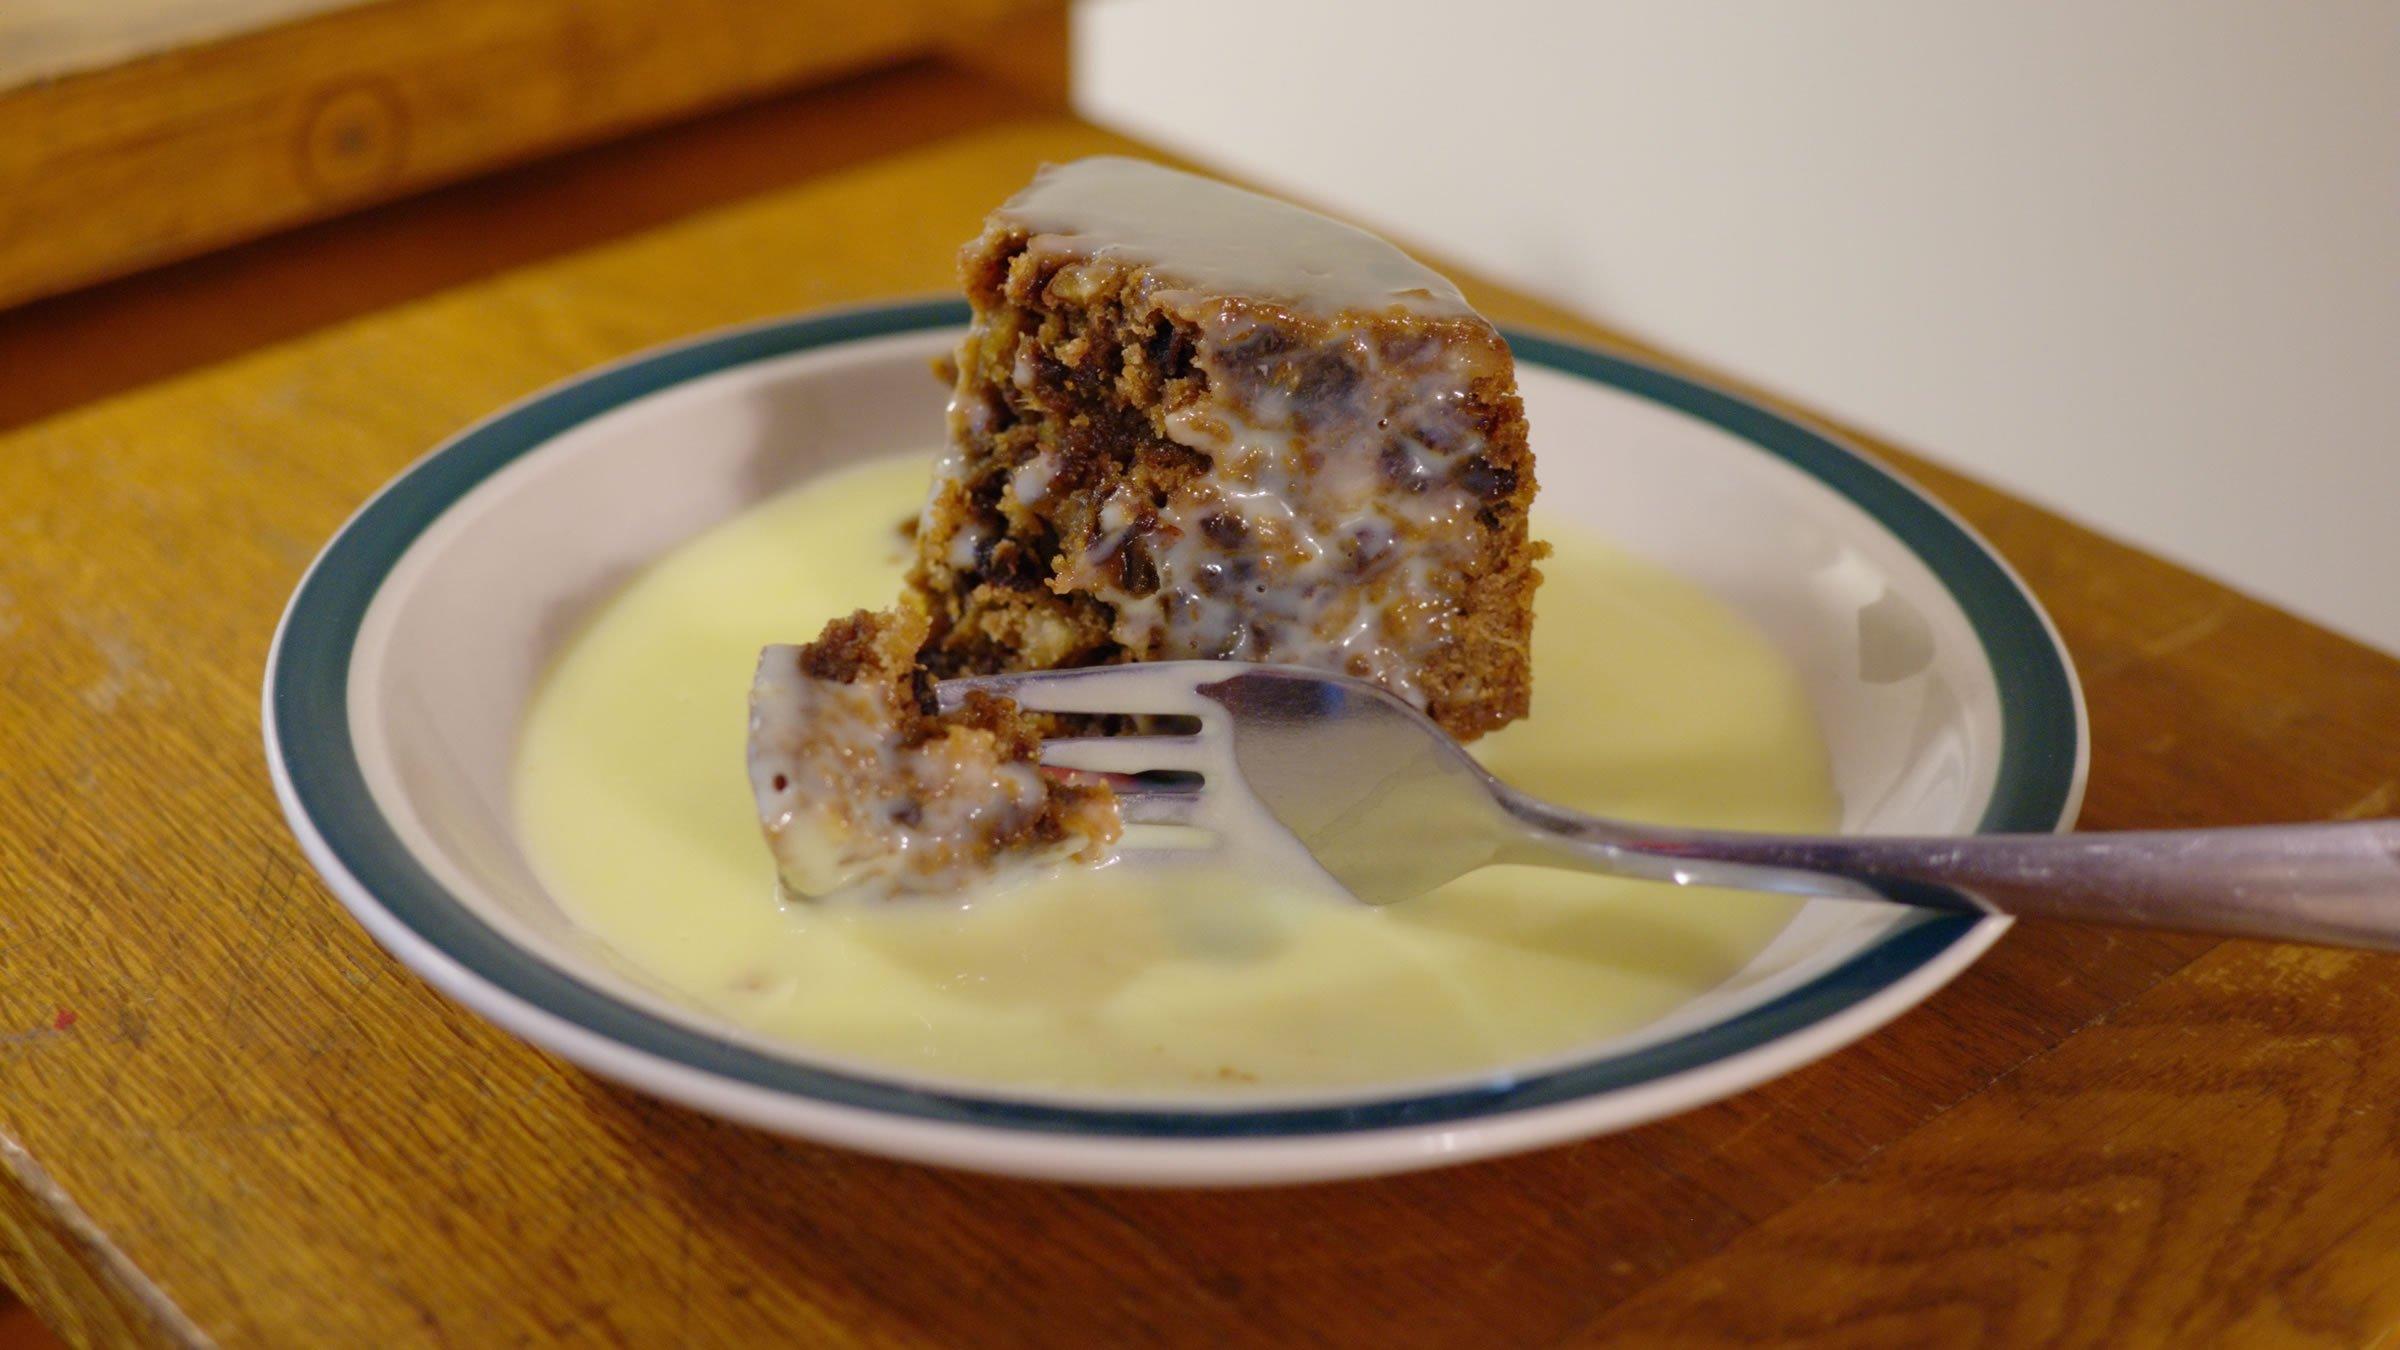 Rica comida de la polizonta - 3 5